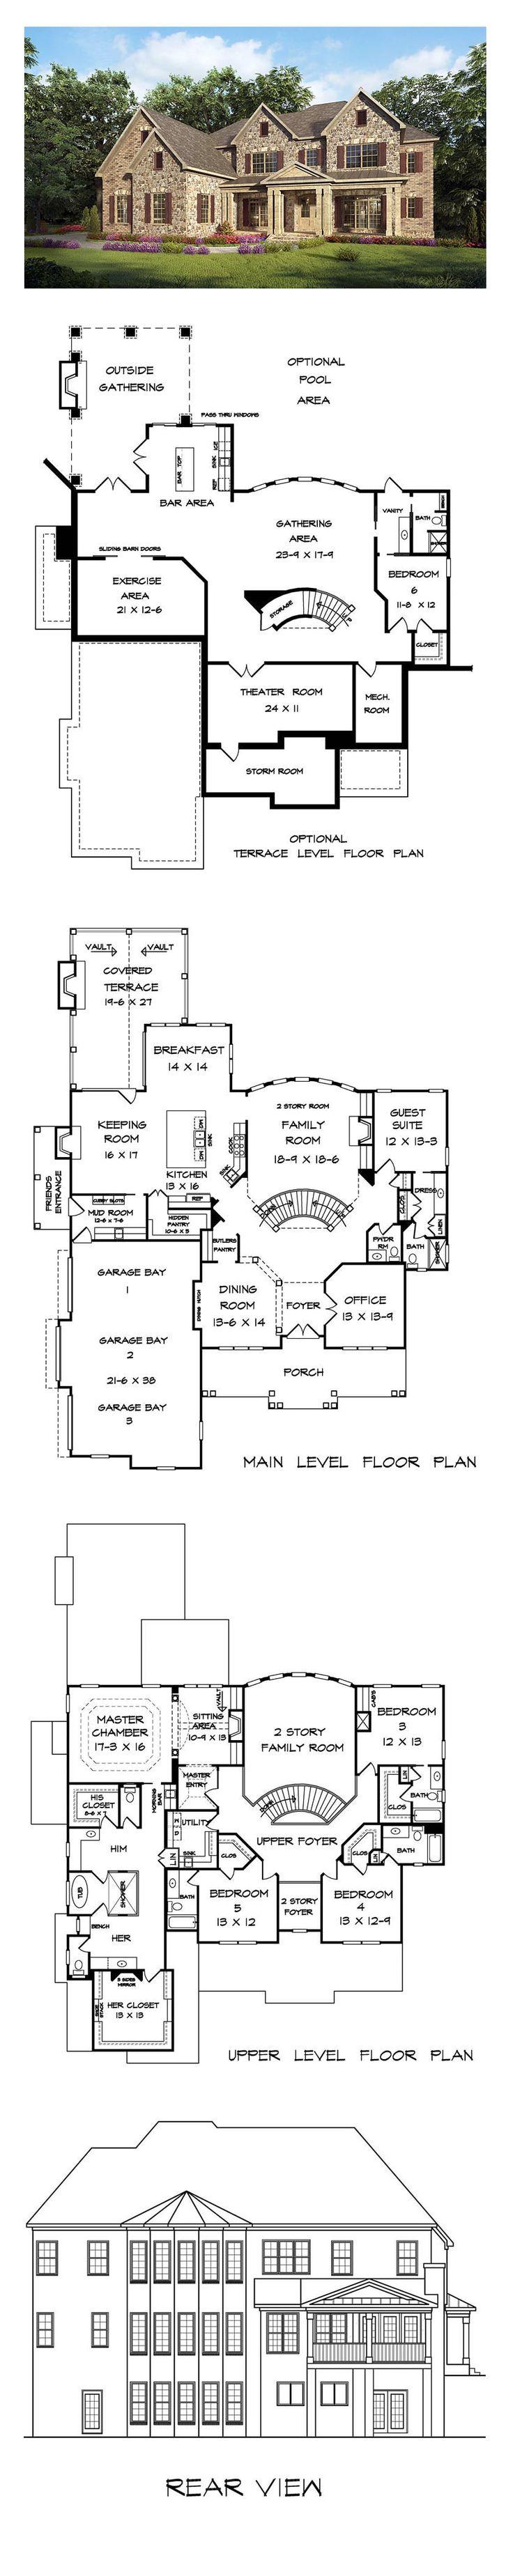 Ensuite badezimmerdesignpläne  best architektur images on pinterest  sims house future house